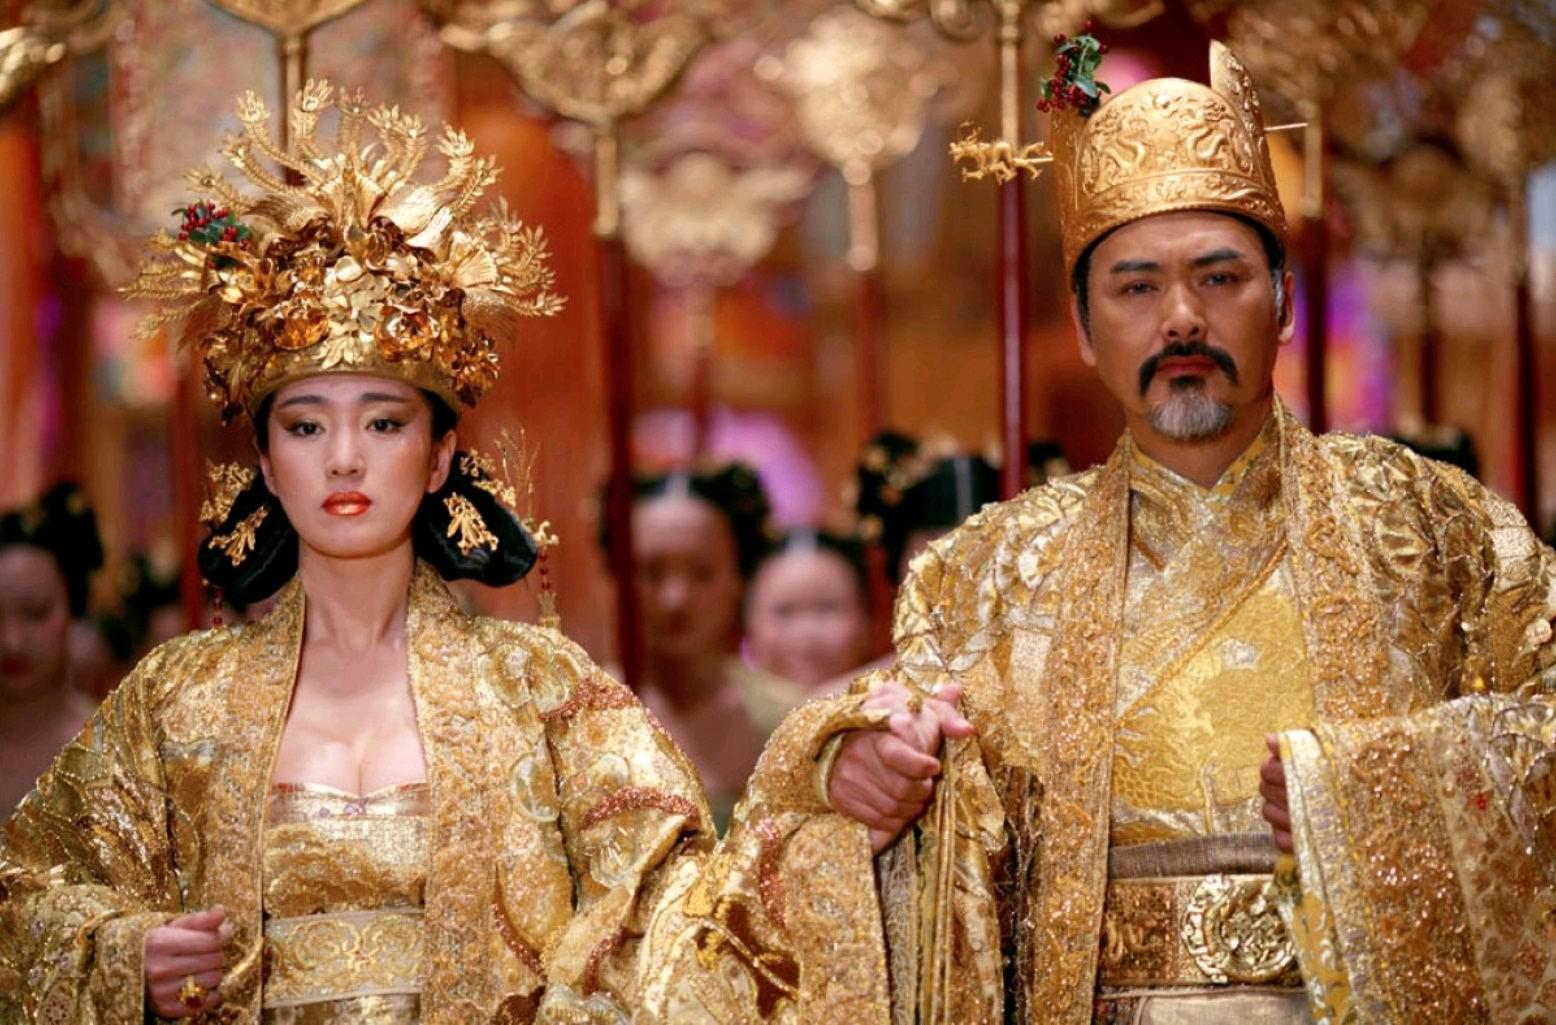 Проклятие золотого цветка / Man cheng jin dai huang jin jia (2012): кадр из фильма